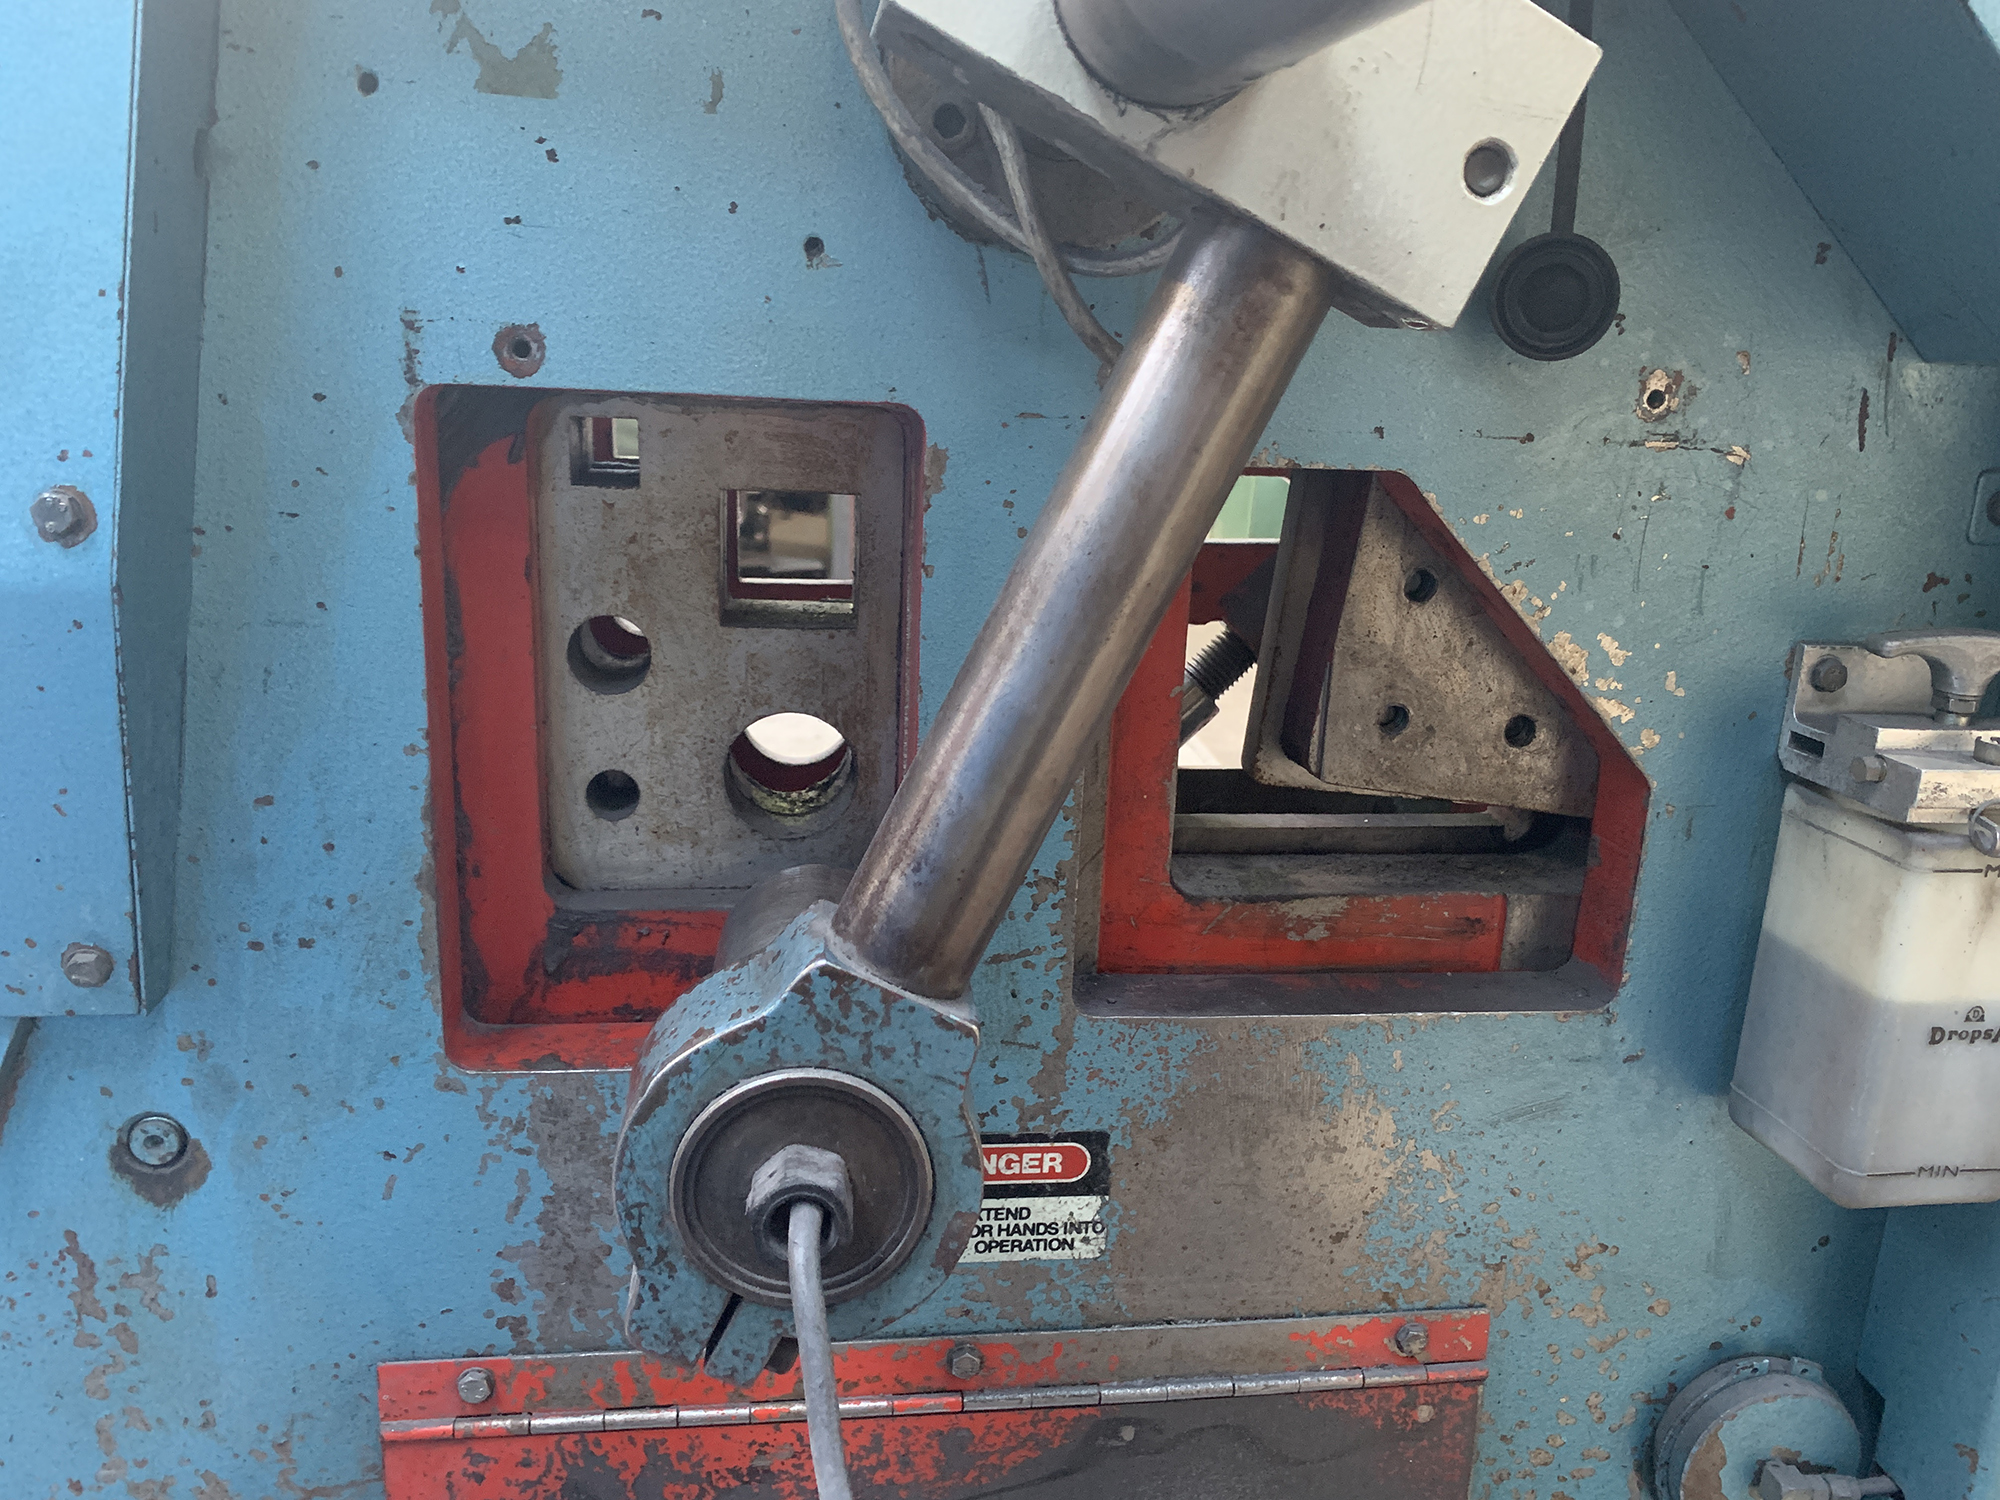 Kingsland 55XS Iron Worker. 55 Ton Capacity. - Image 7 of 8